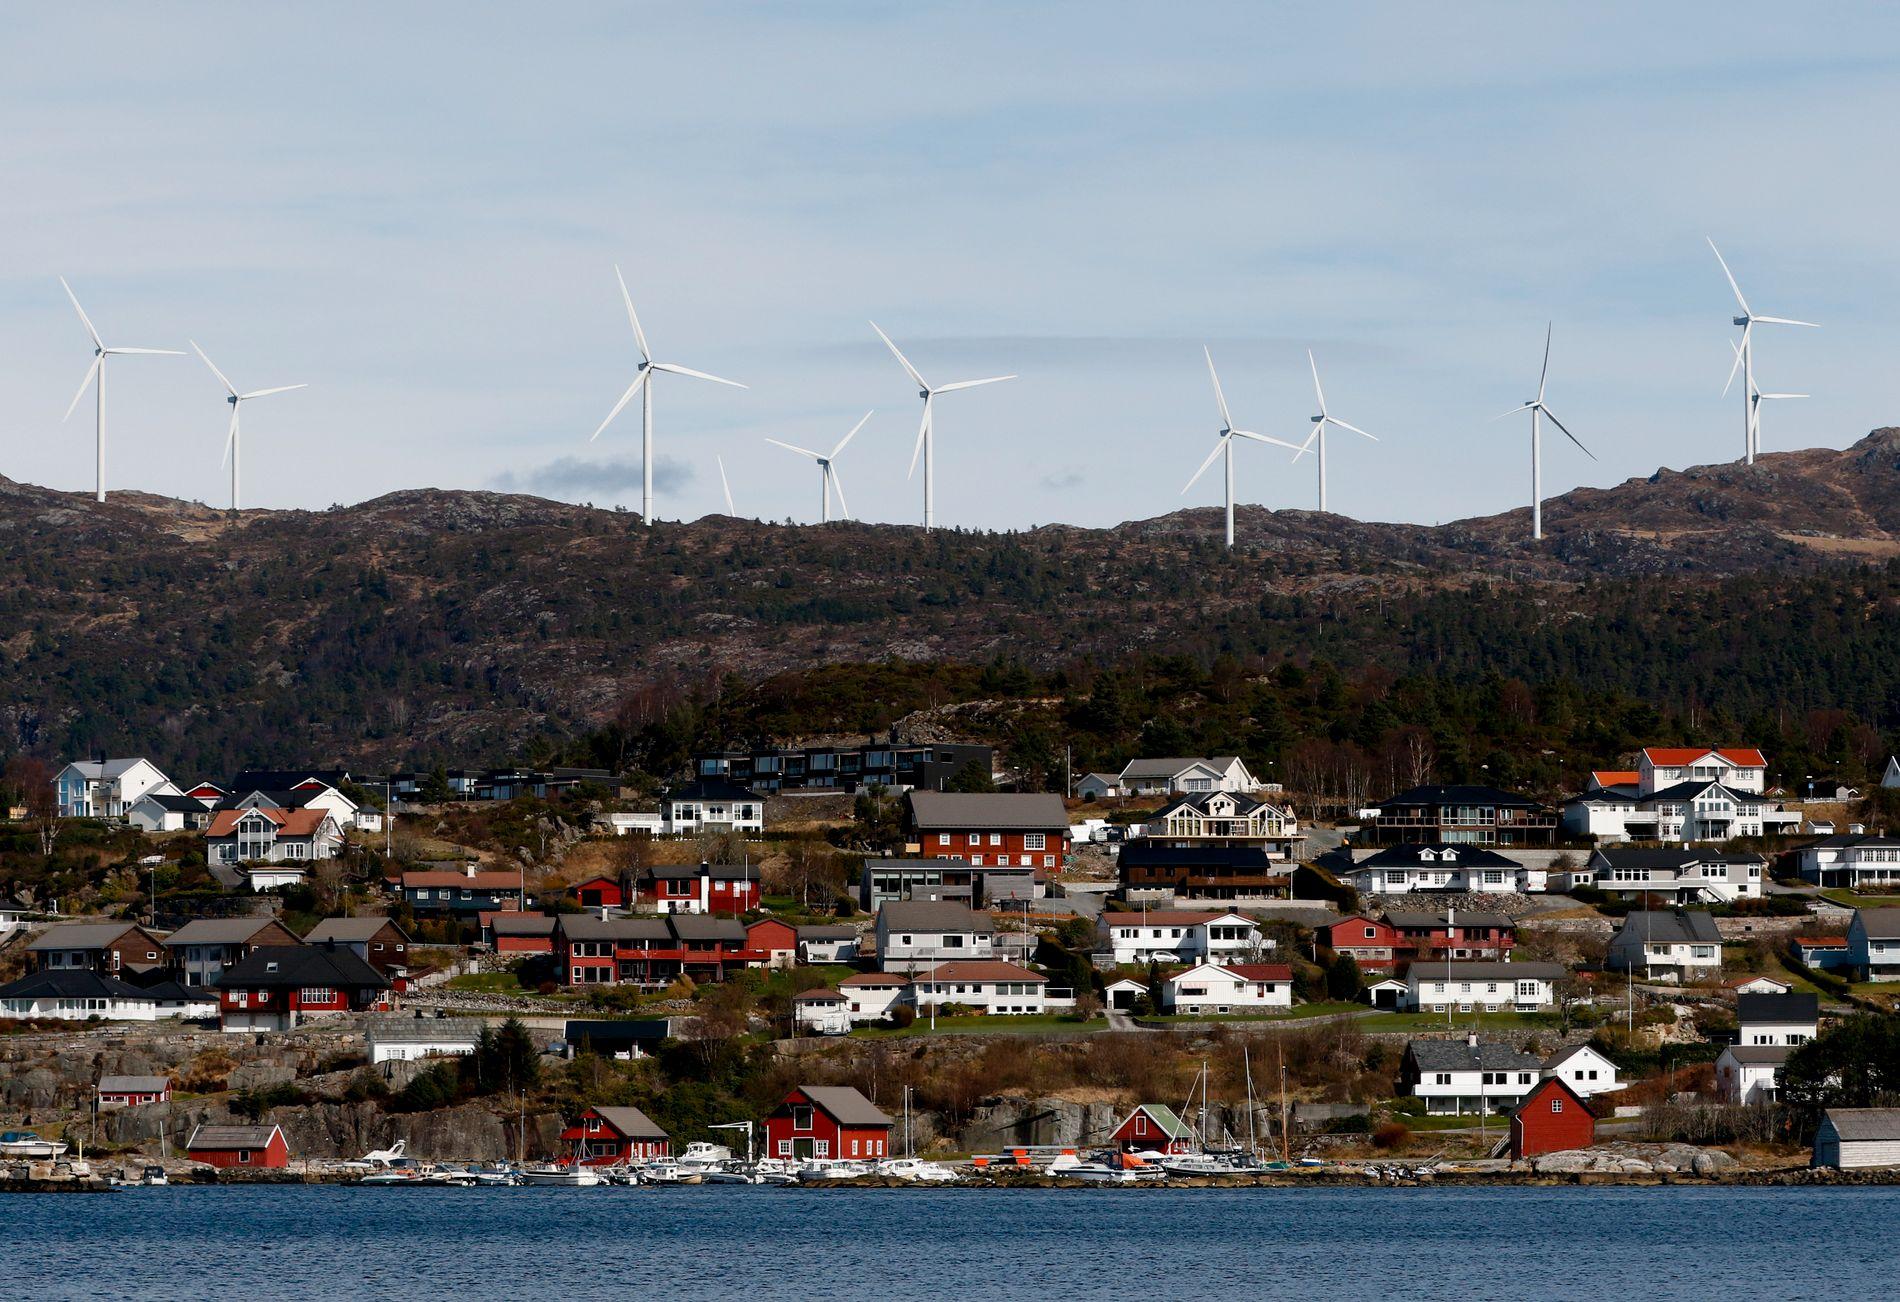 NEI-VIND: Vindmøller på land har ført til stor kamp i de fleste Norske partier i vår. Bildet viser vindturbiner i Fitjar kommune.